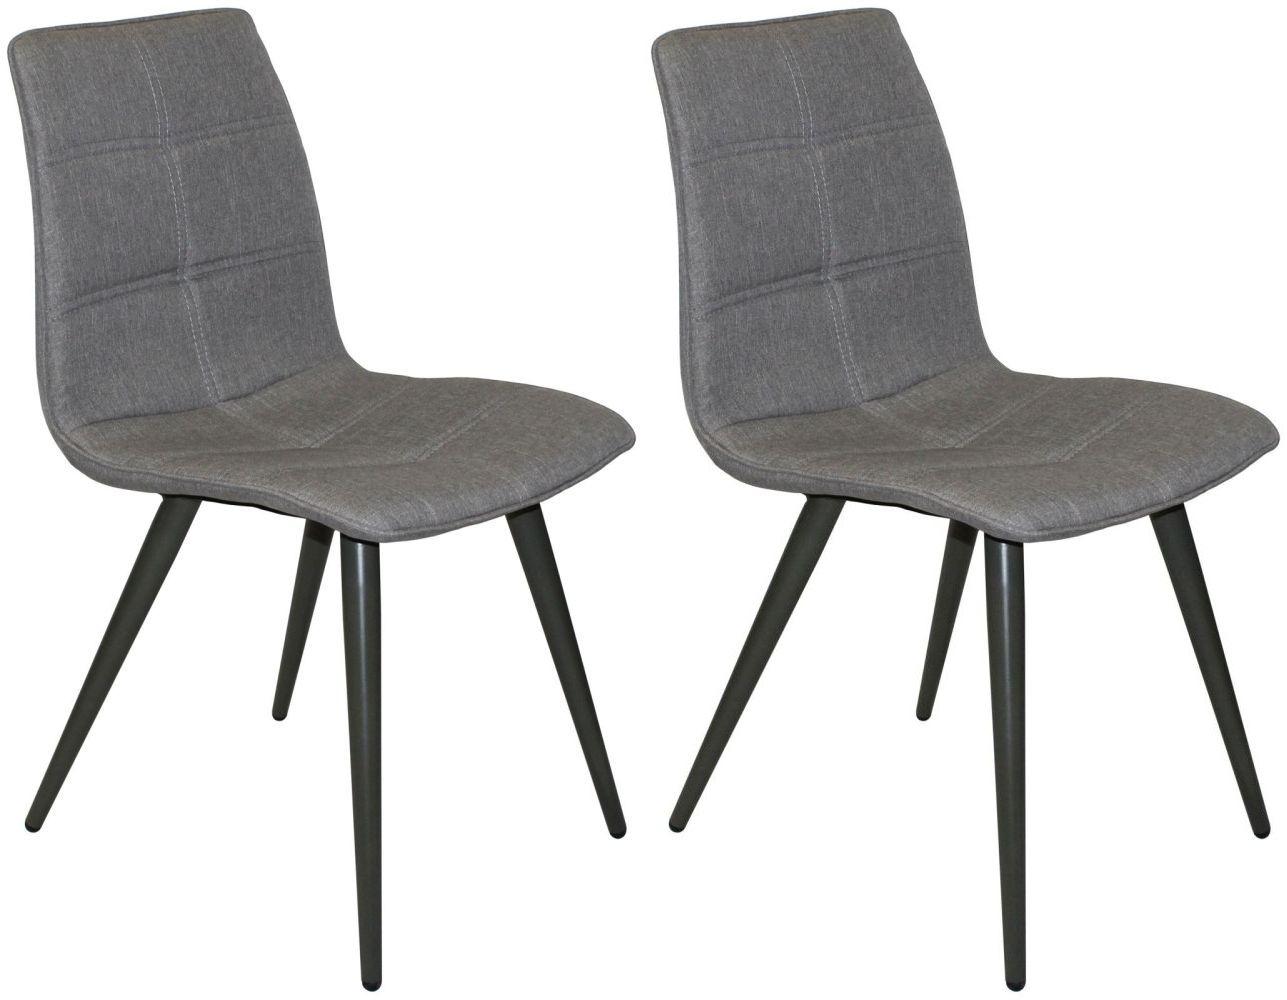 Reflex Grey Dining Chair (Pair)